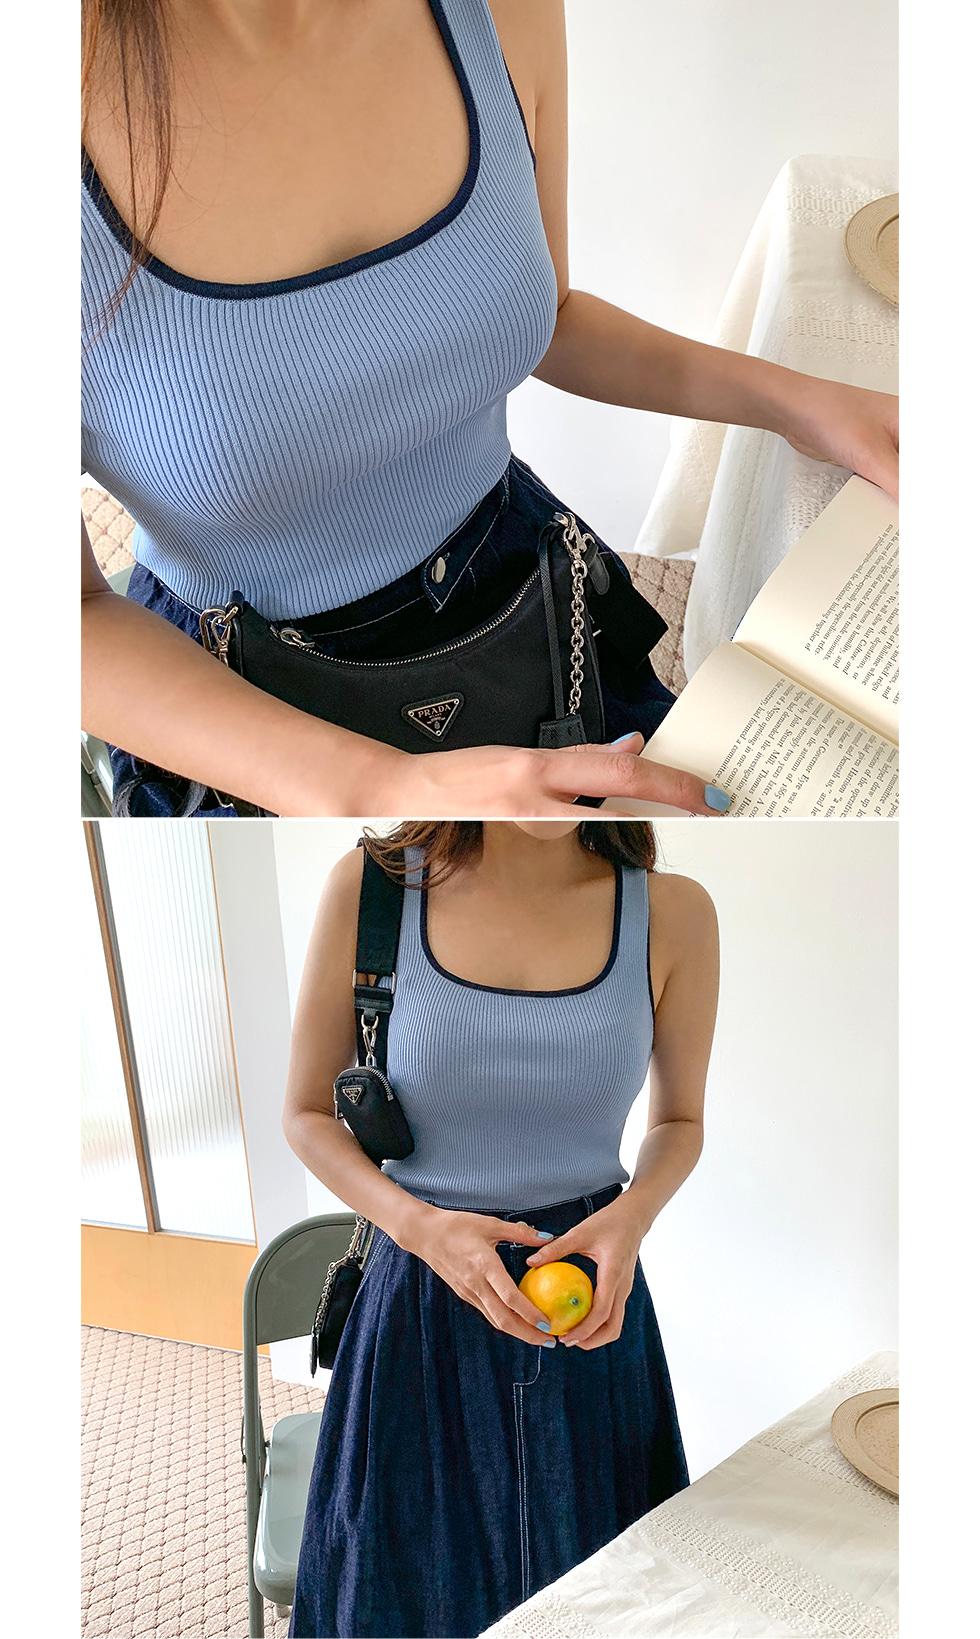 Vitamin Sleeveless Knitwear